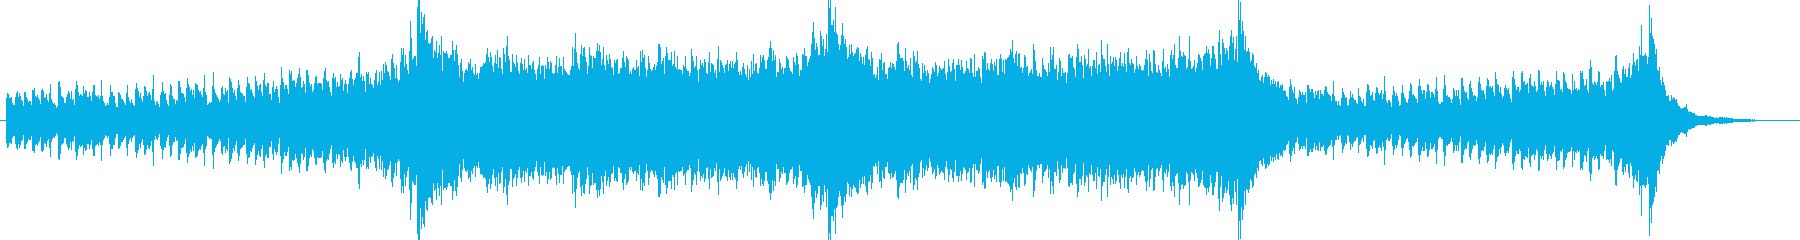 Orchestral- Pop-R...の再生済みの波形